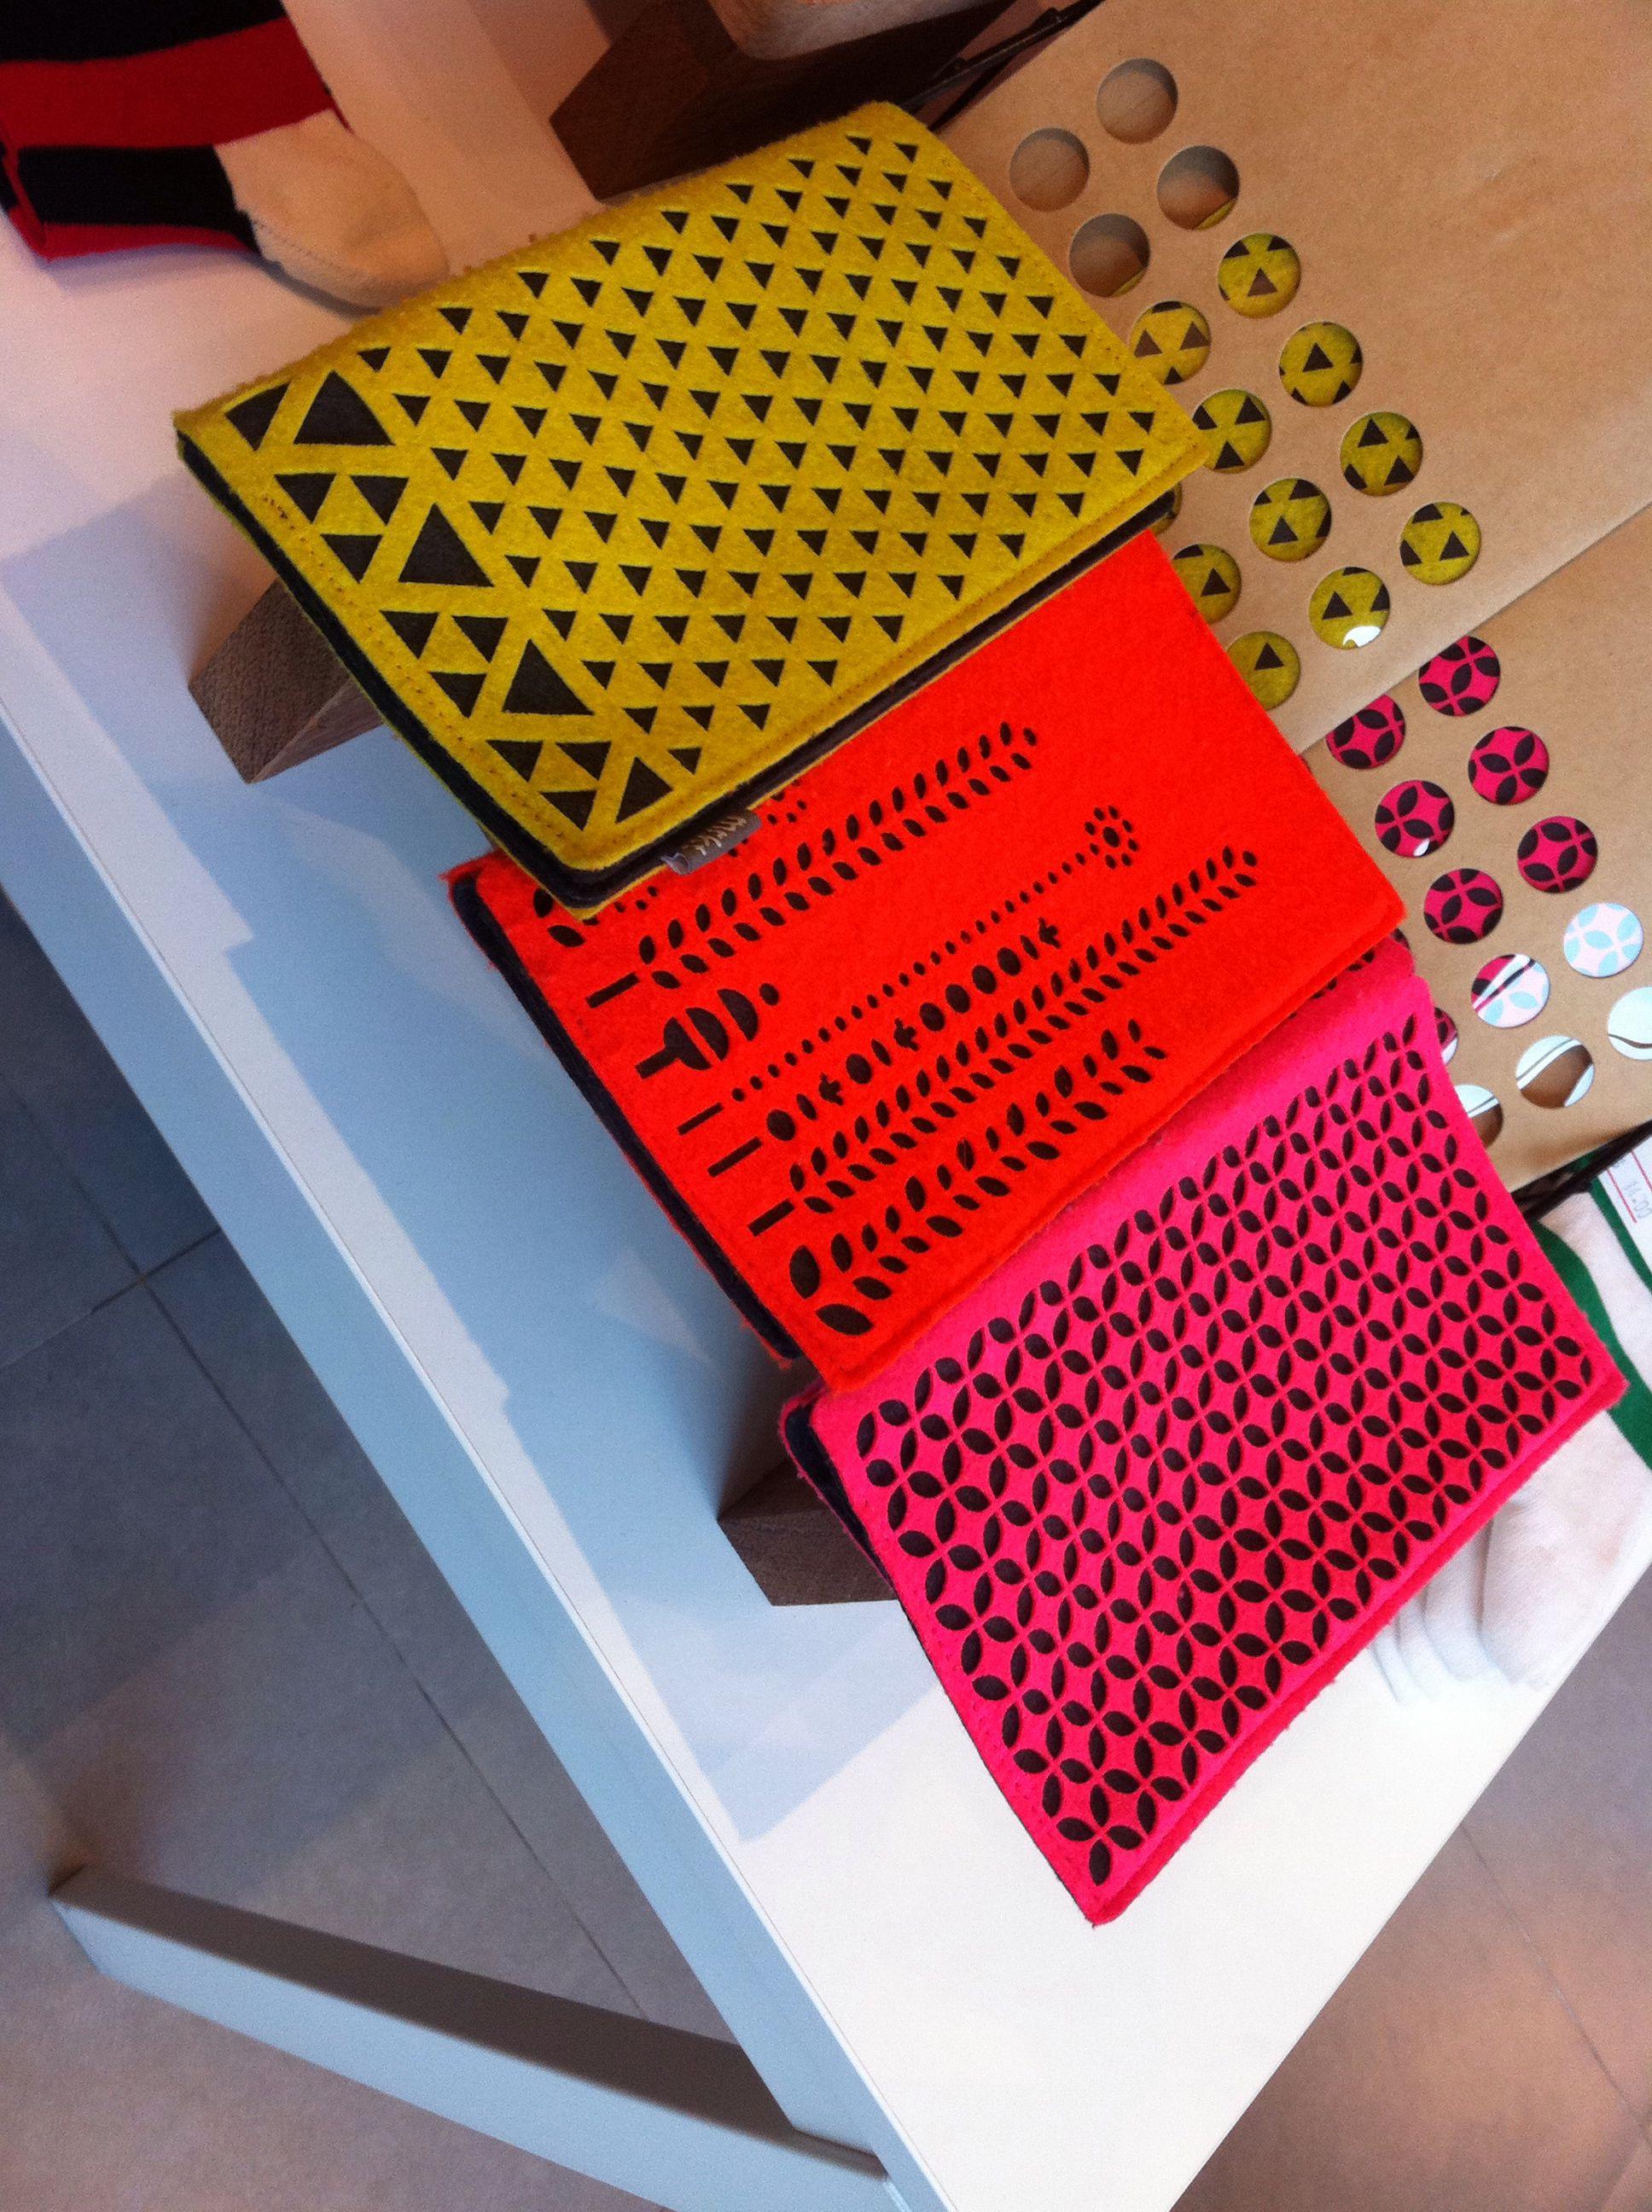 Laser Cut Out Notebooks Singapore Neon Laser Cutter